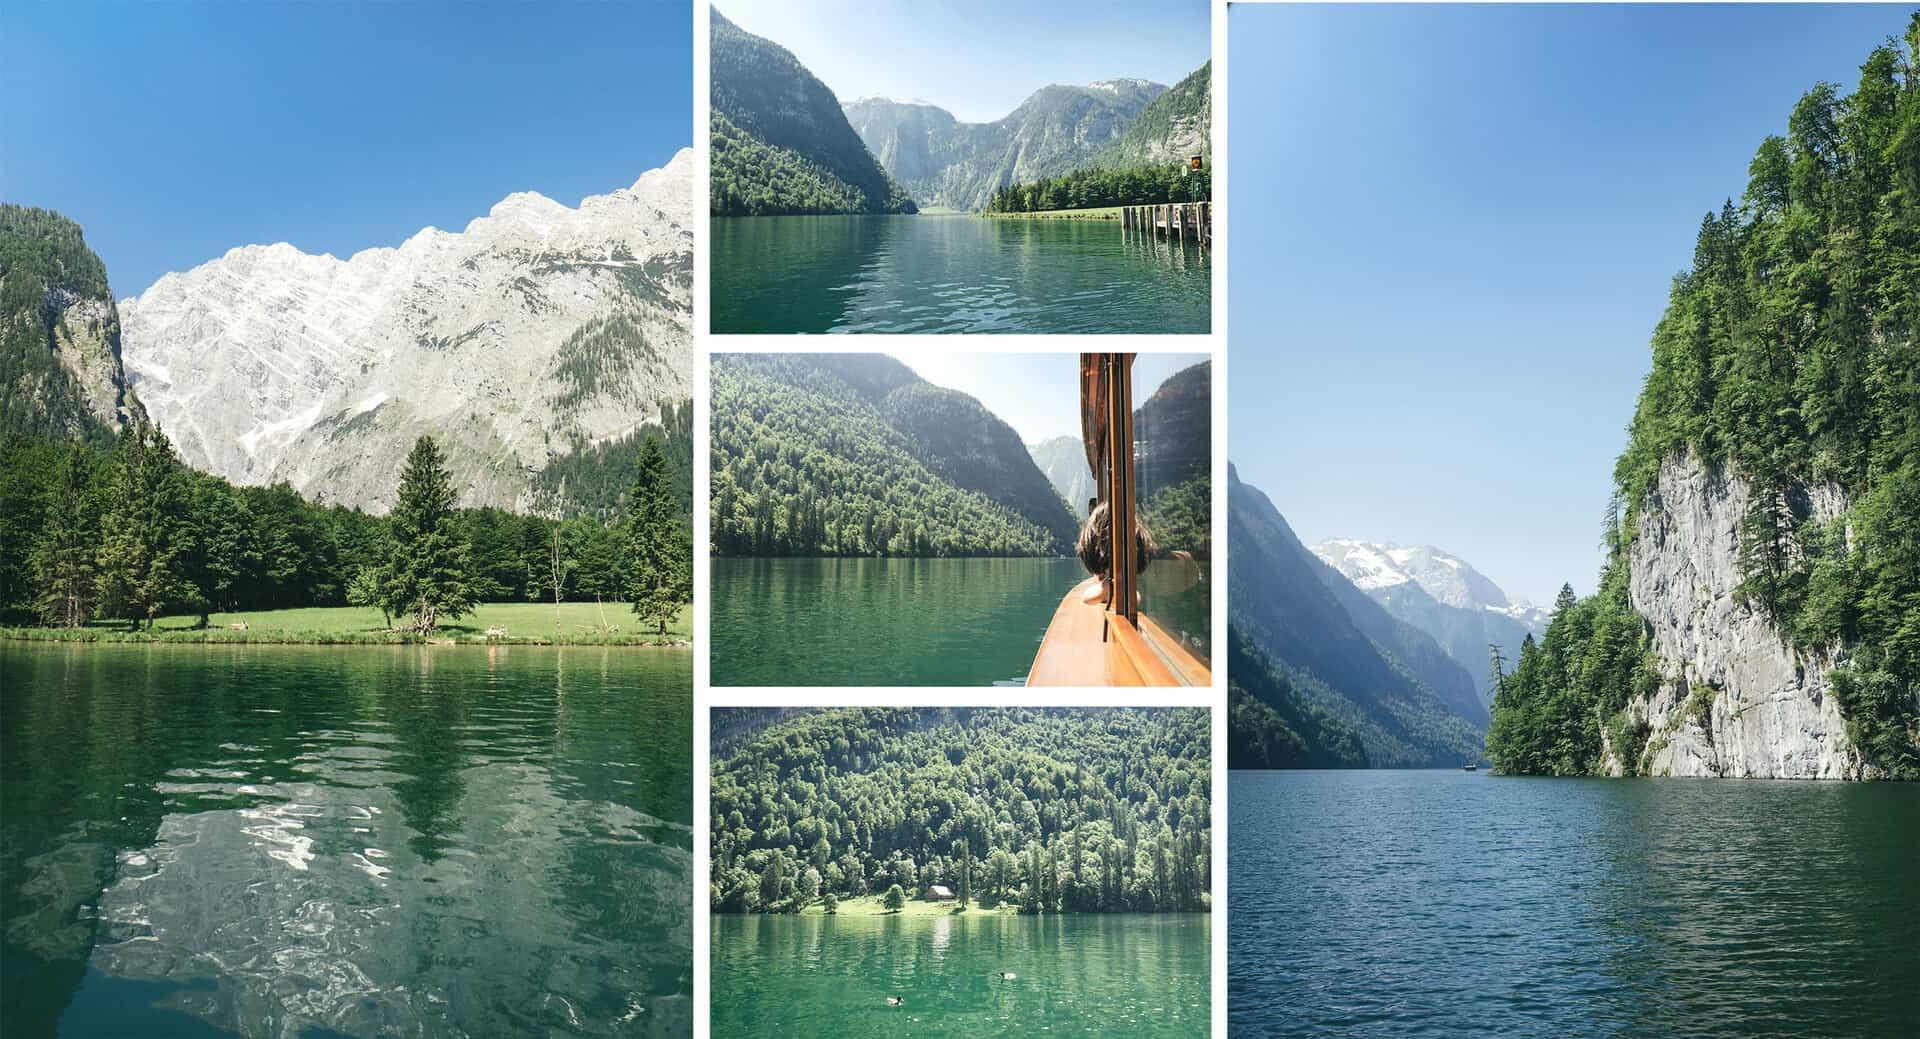 lagos obersee e konigssee